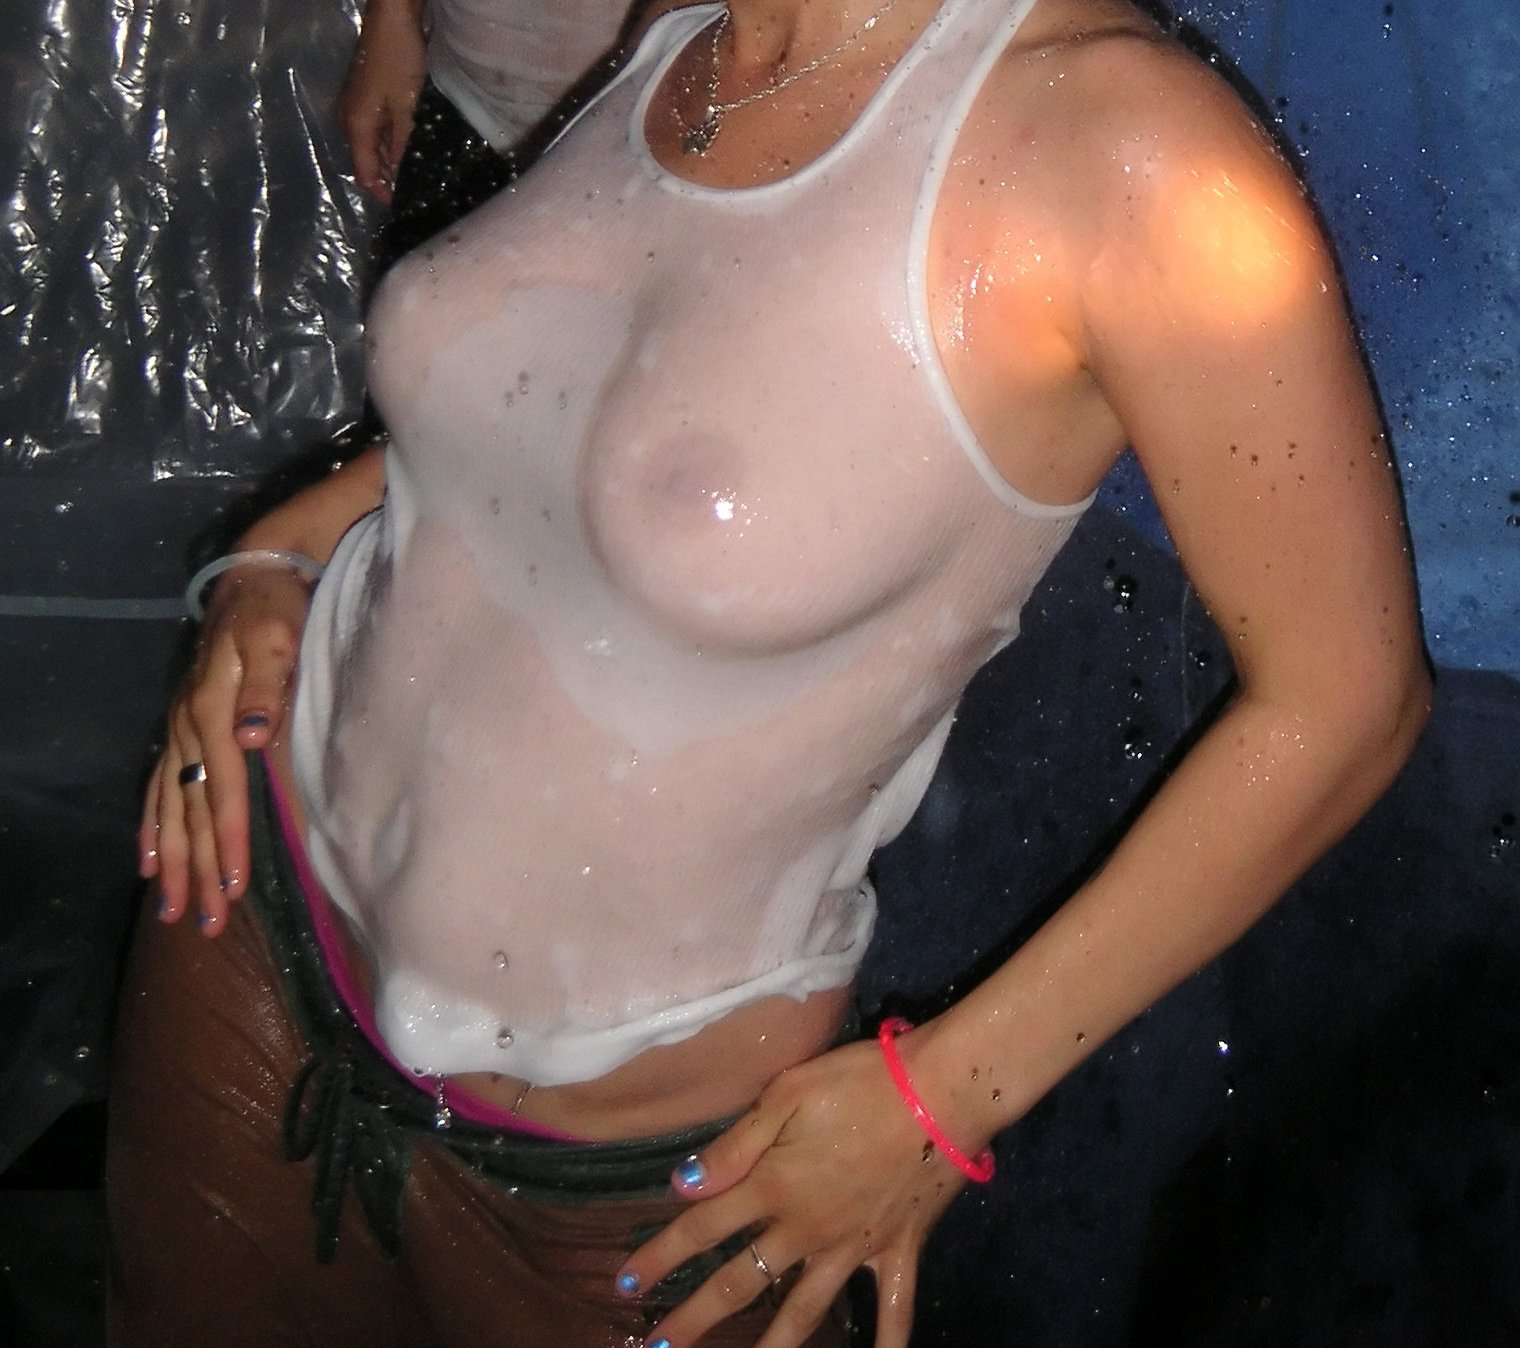 Wet shirt blowjob, naked pics of david nugent